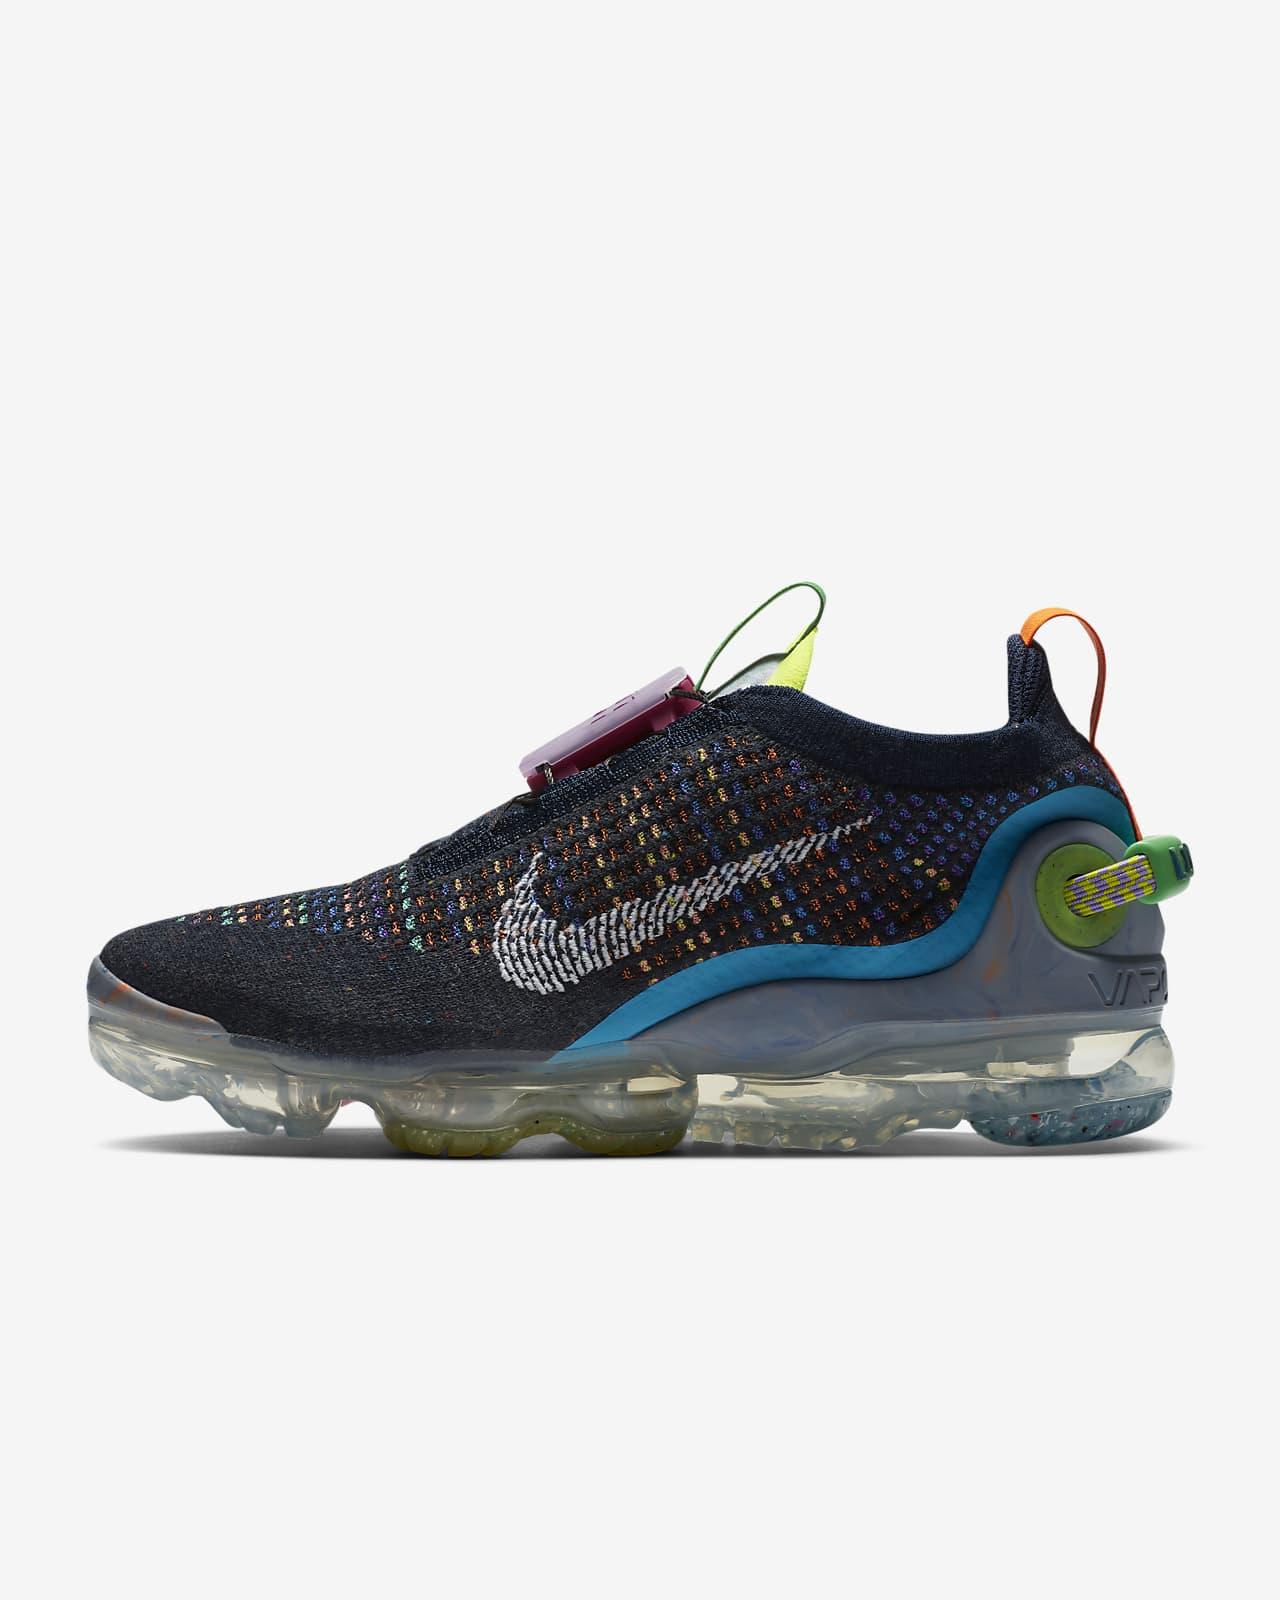 Chaussure Nike Air VaporMax 2020 FK pour Femme